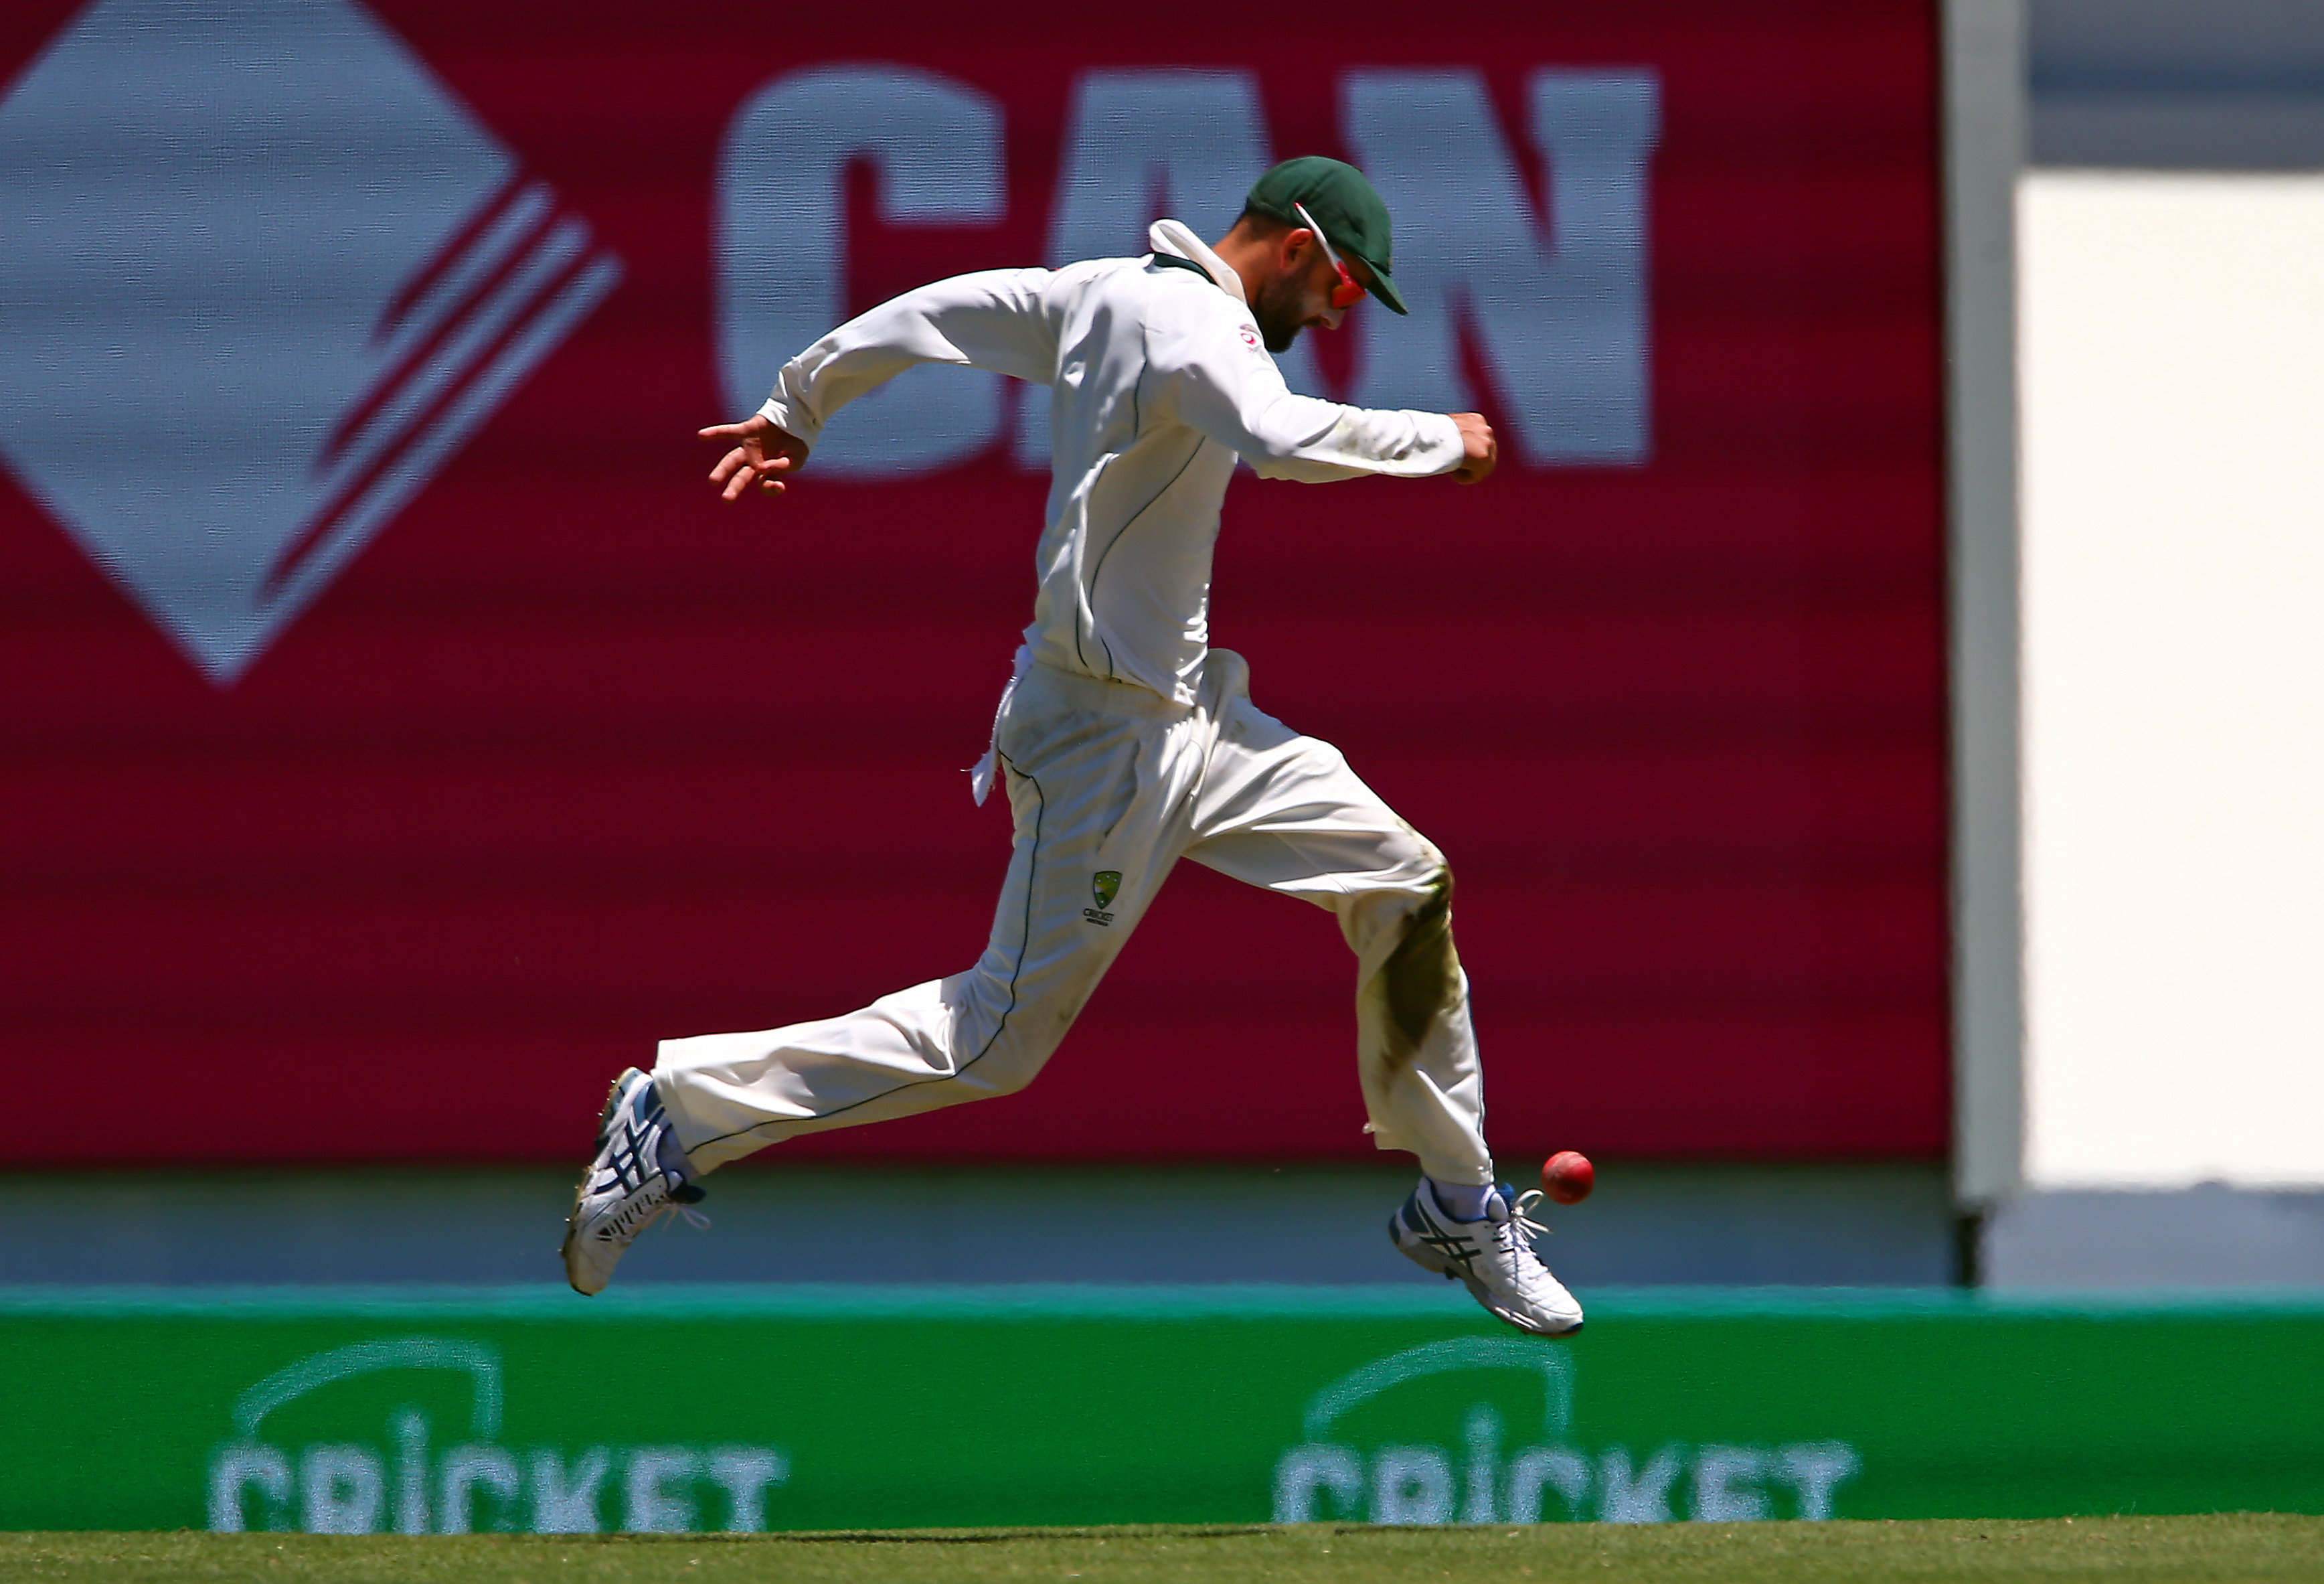 Cricket - Australia v Pakistan - Third Test cricket match - Sydney Cricket Ground, Sydney, Australia - 7/1/17 Australia's Nathan Lyon kicks the ball after it landed near him.  REUTERS/David Gray